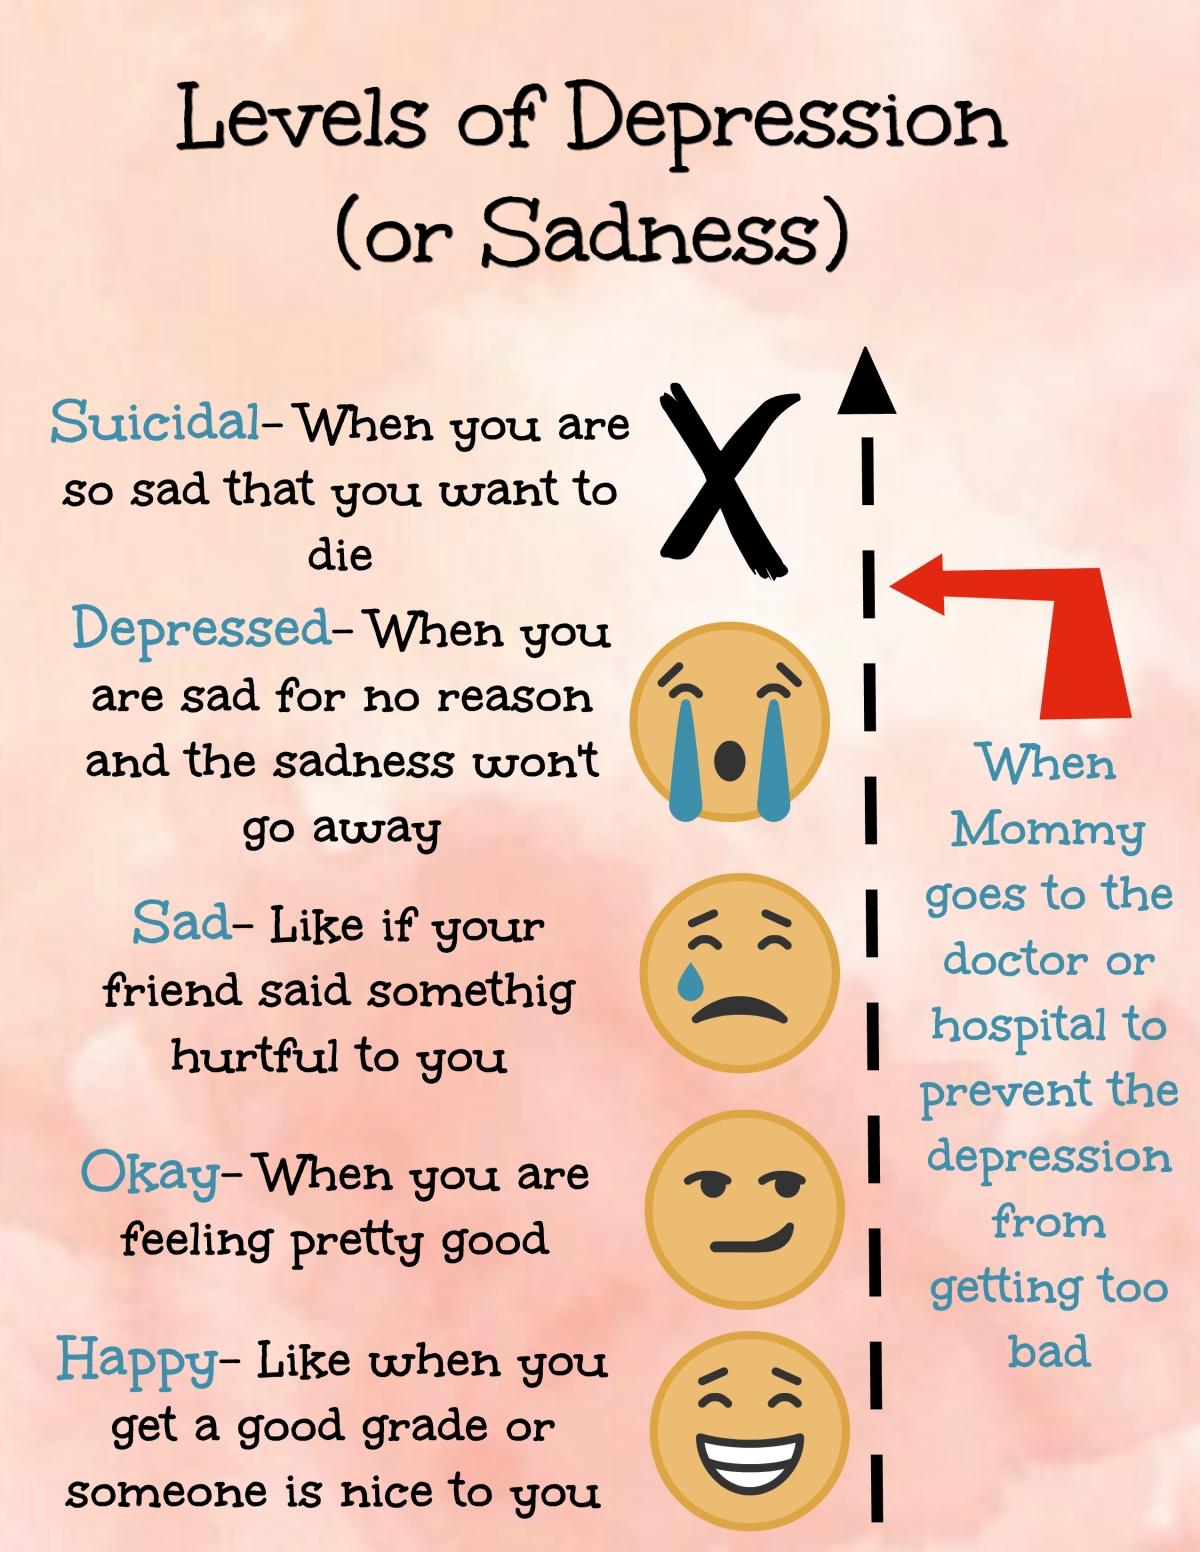 Level of depression.jpg